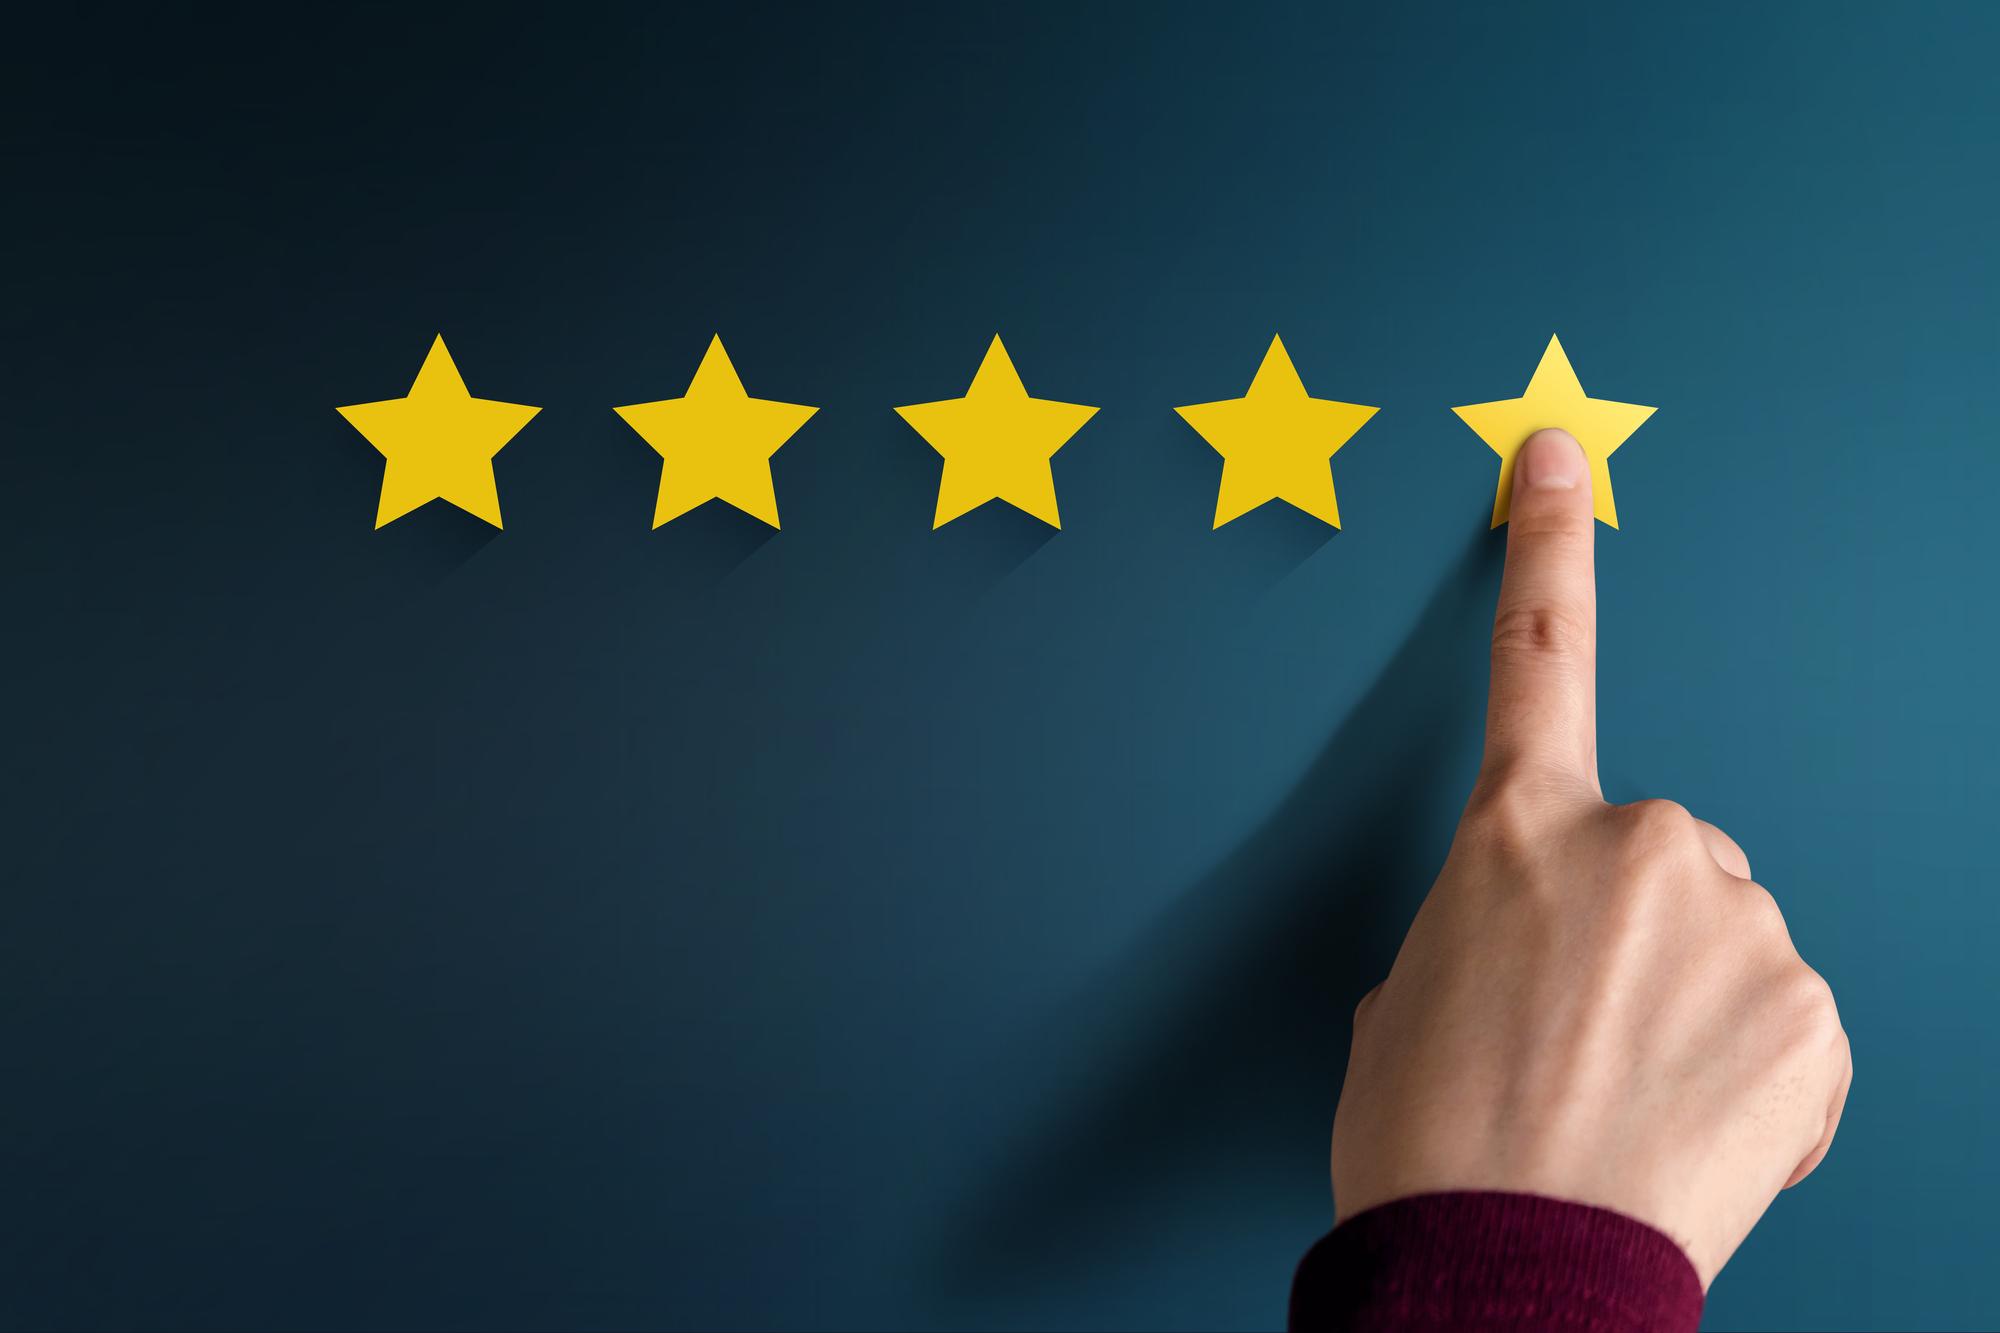 Online Reviews - 5 Stars